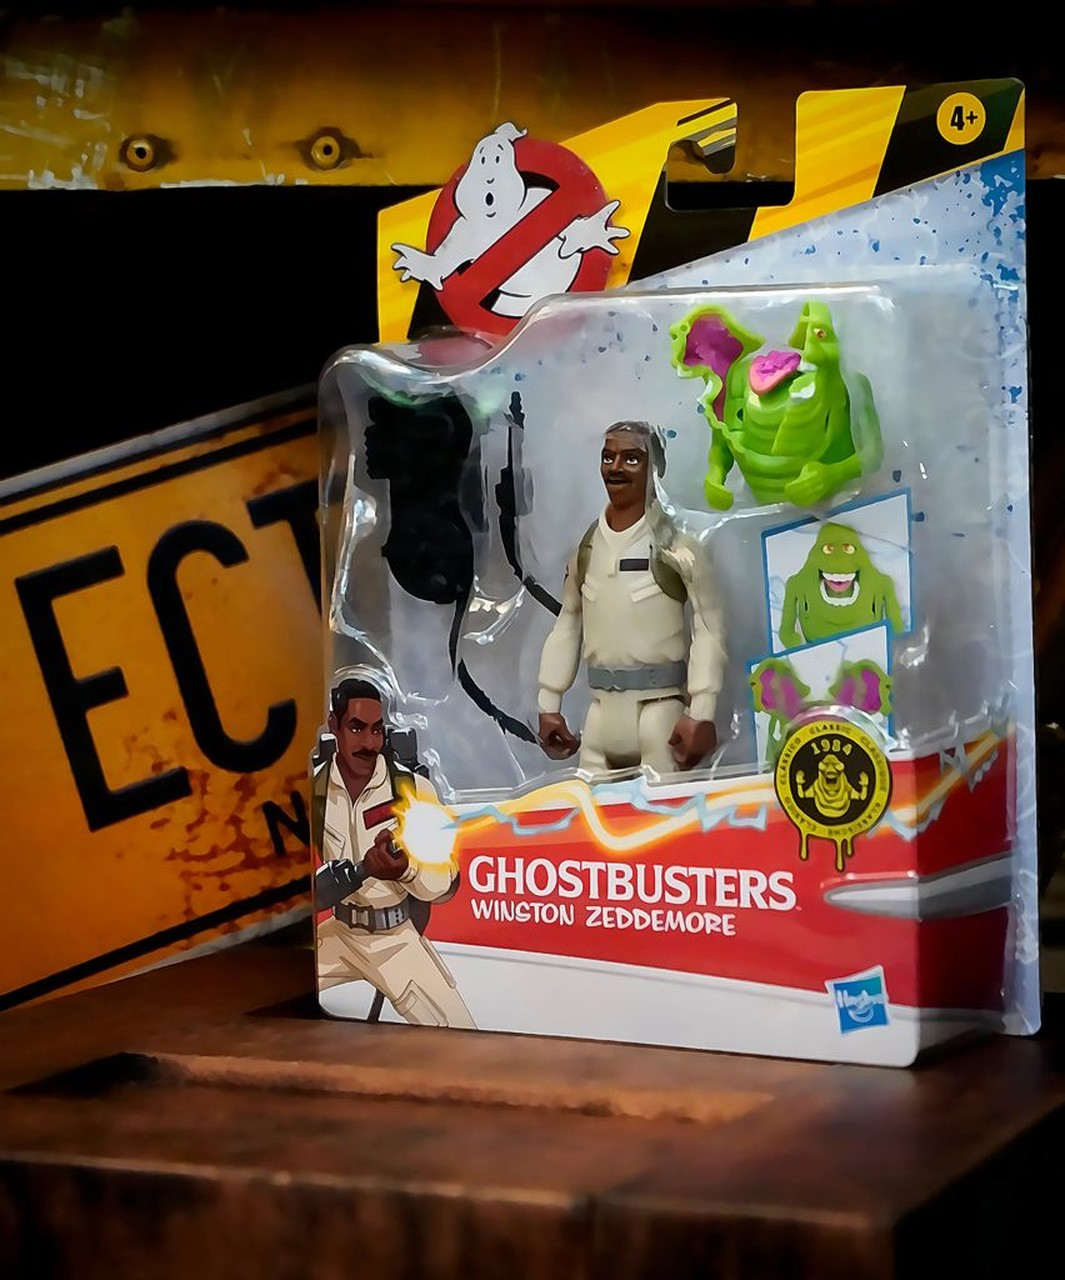 Boneco Action Figure Winston Zeddemore e Fantasma Geleia Slime Os Caça Fantasmas Ghostbusters E9544 - Hasbro